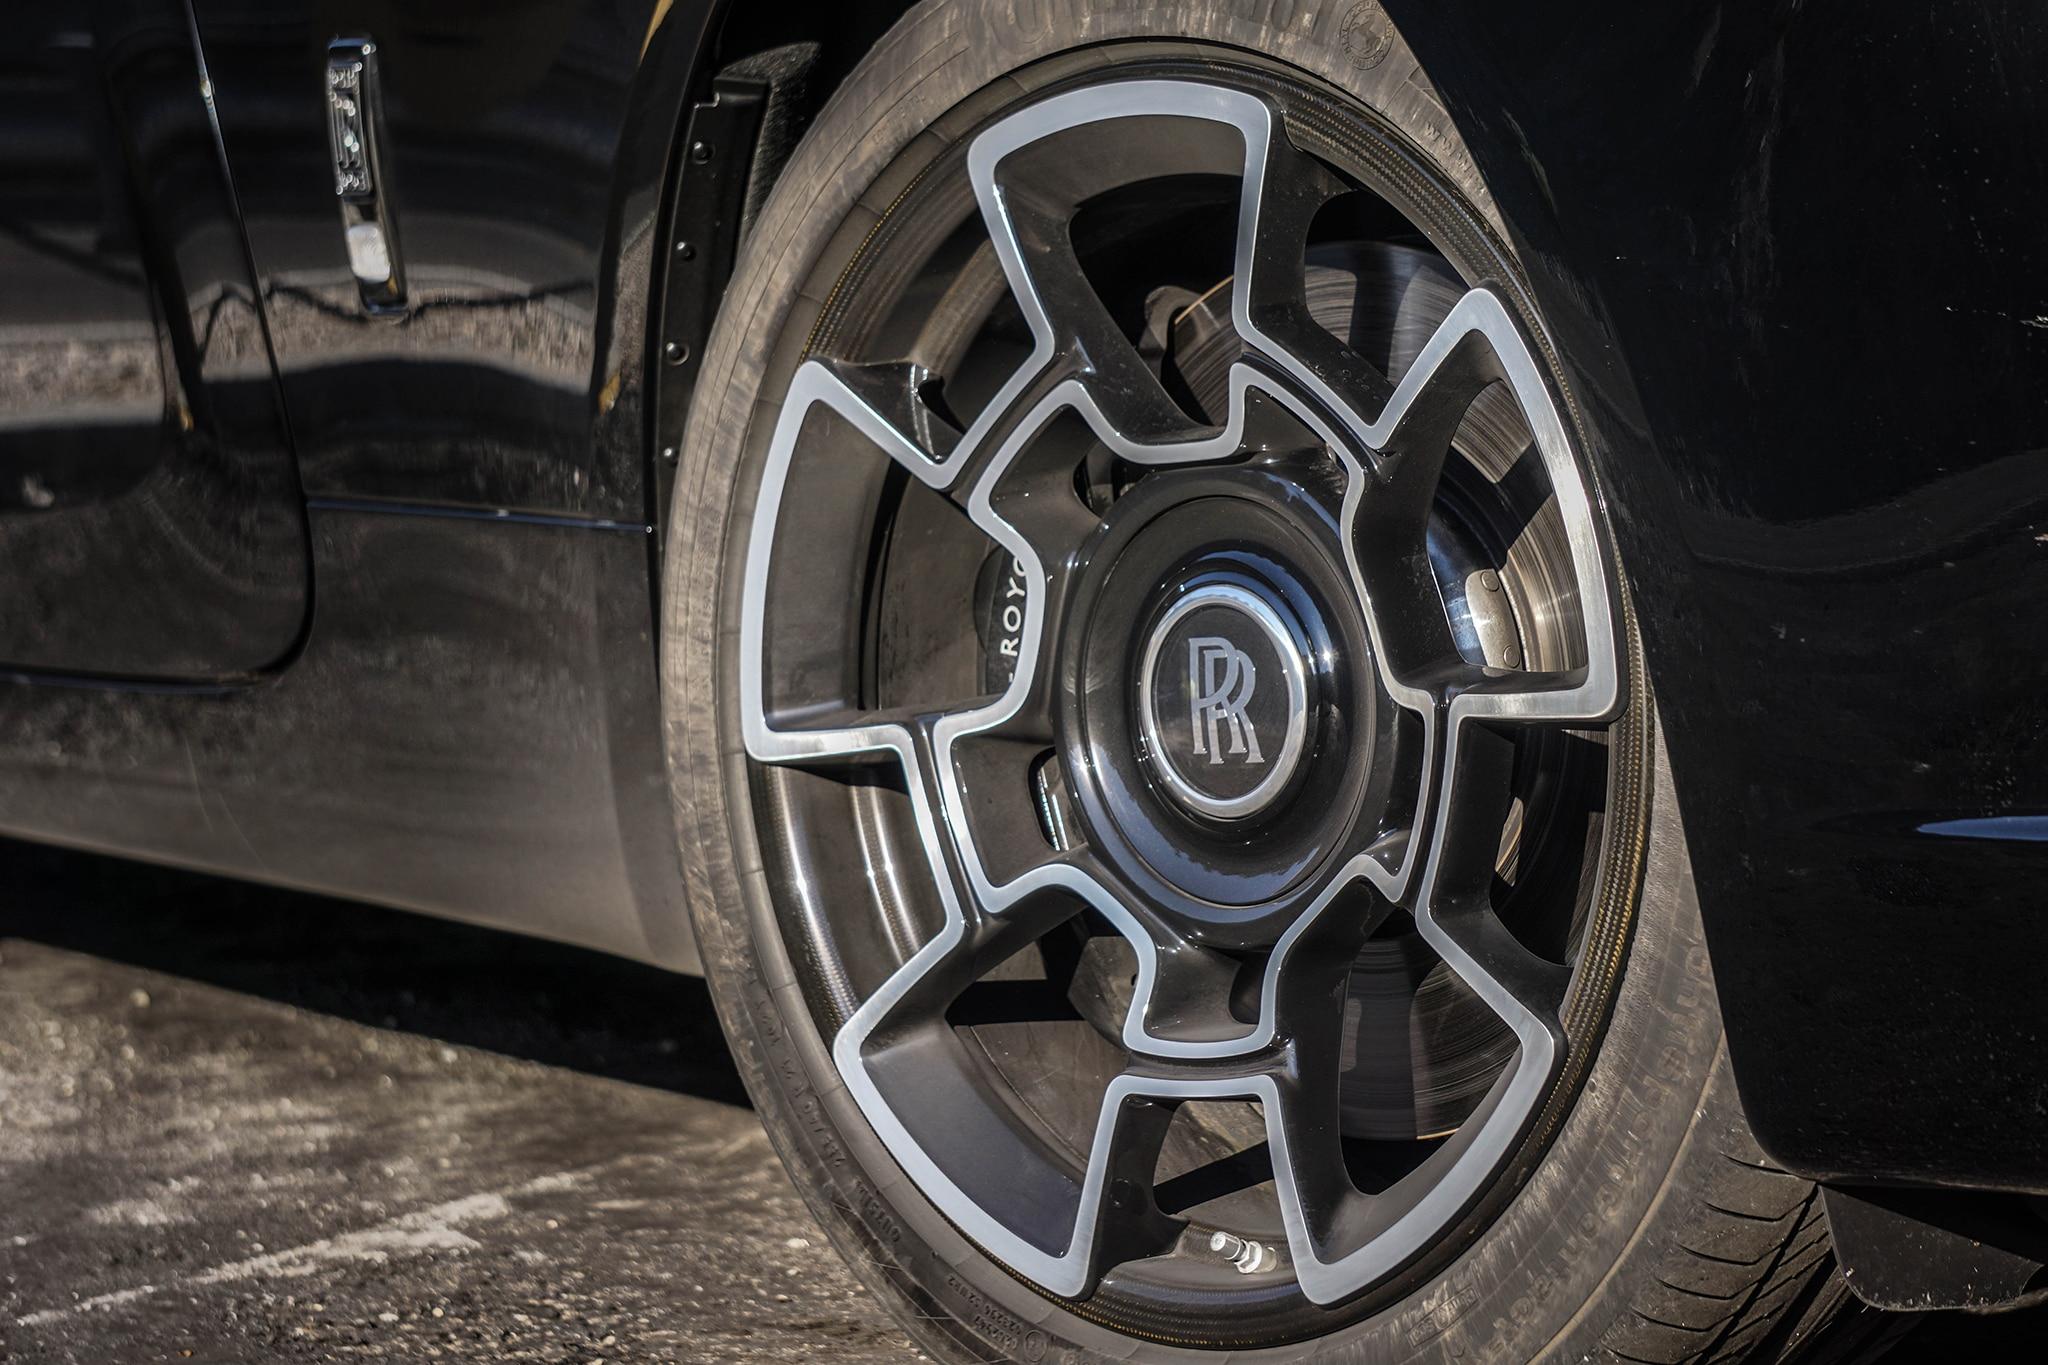 The Wraith Car >> 2017 Rolls-Royce Wraith Black Badge: 13 Things to Know